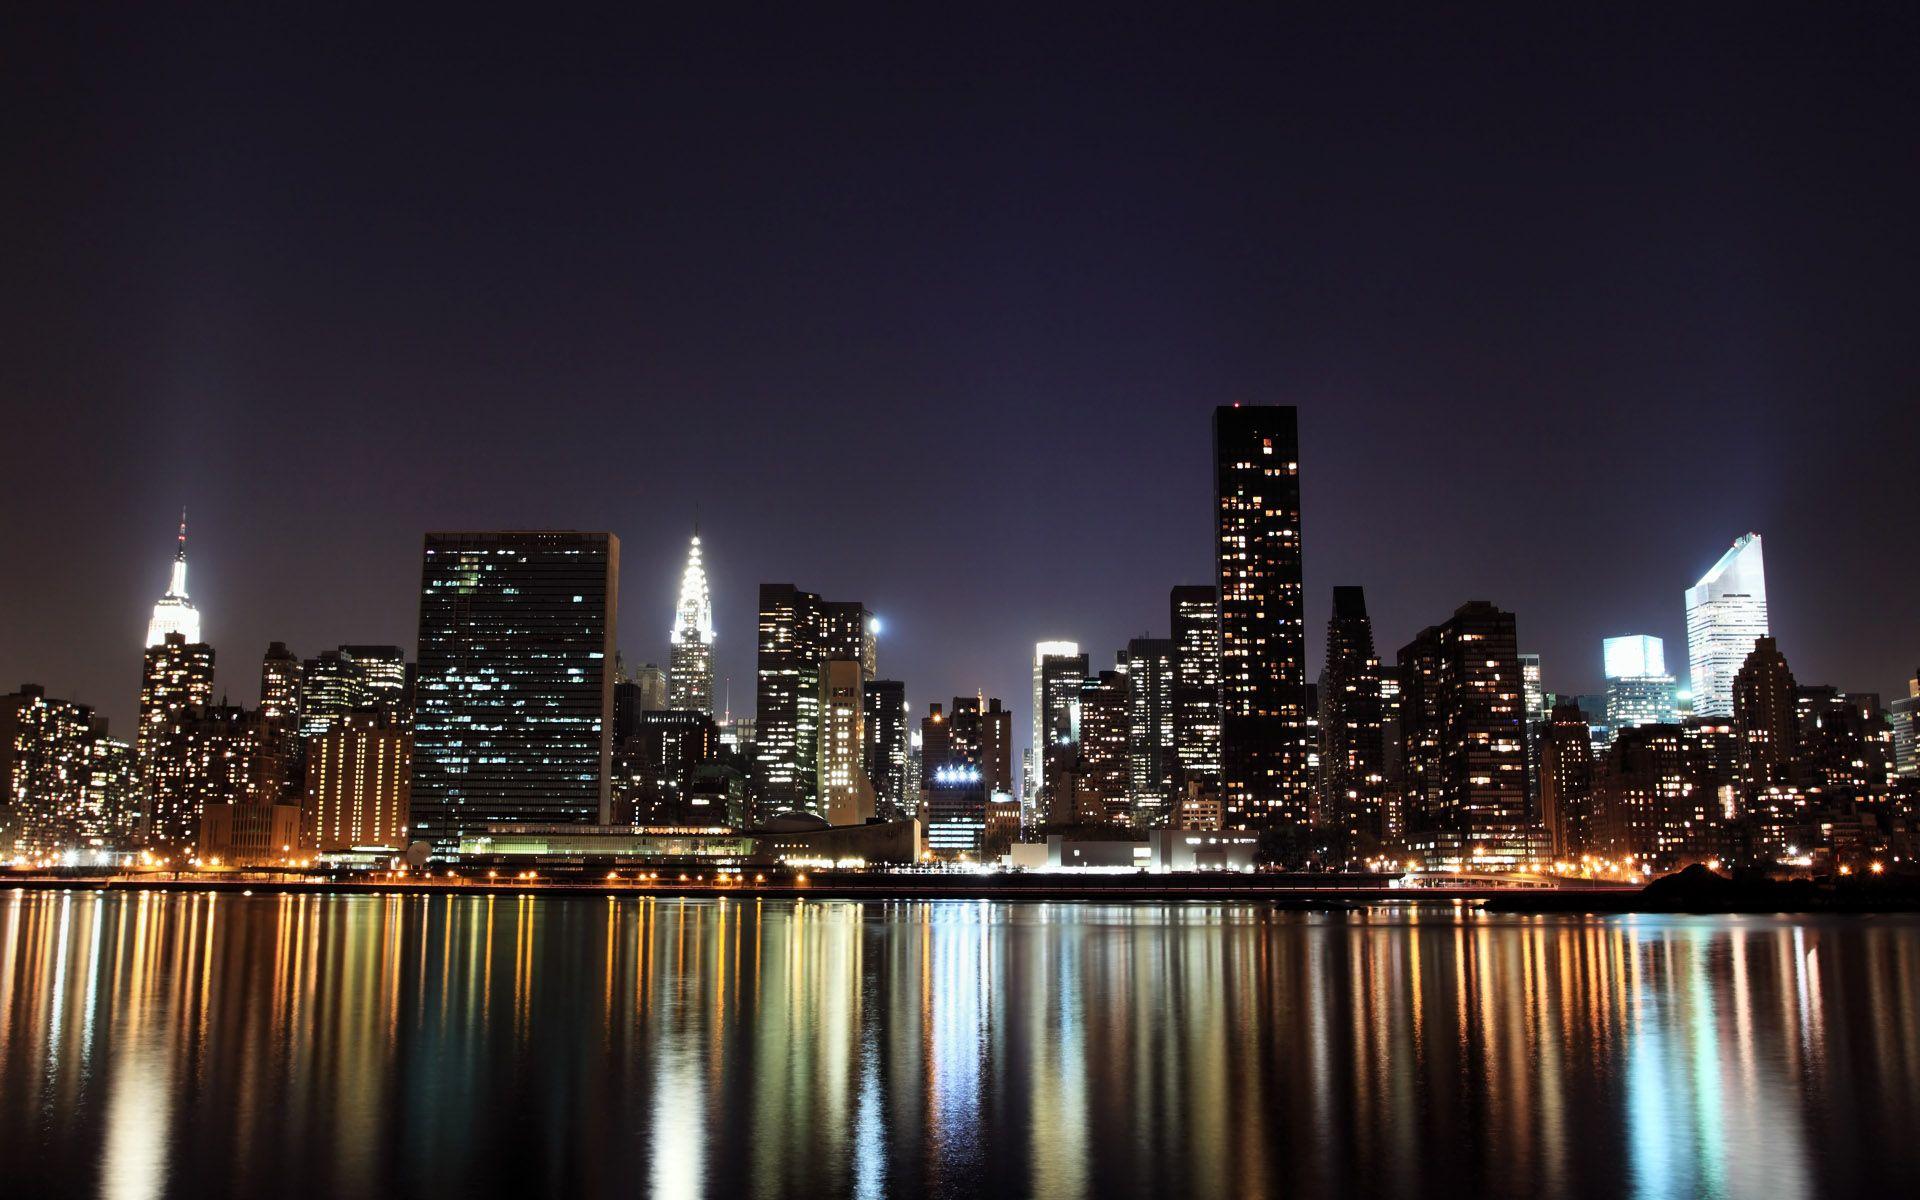 City Night Light Bing Images New York Wallpaper City Wallpaper Skyline